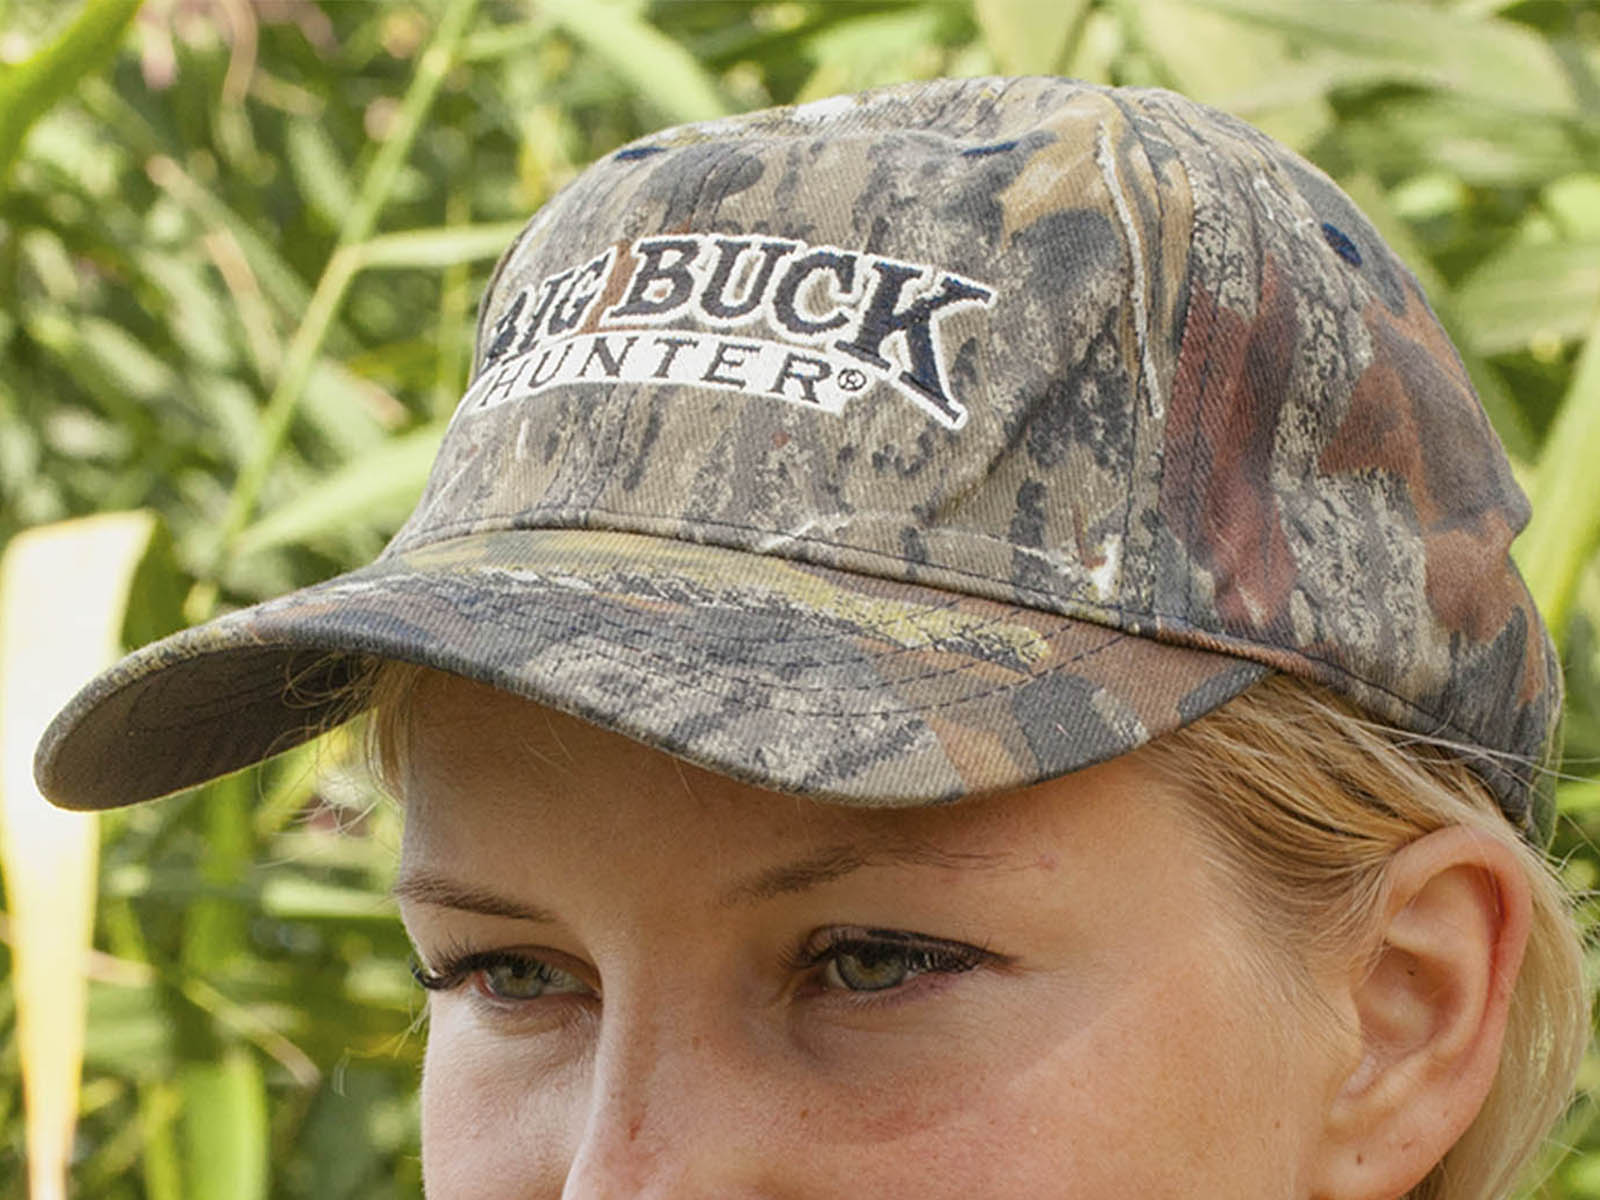 Брендовая милитари бейсболка Big Buck Hunter